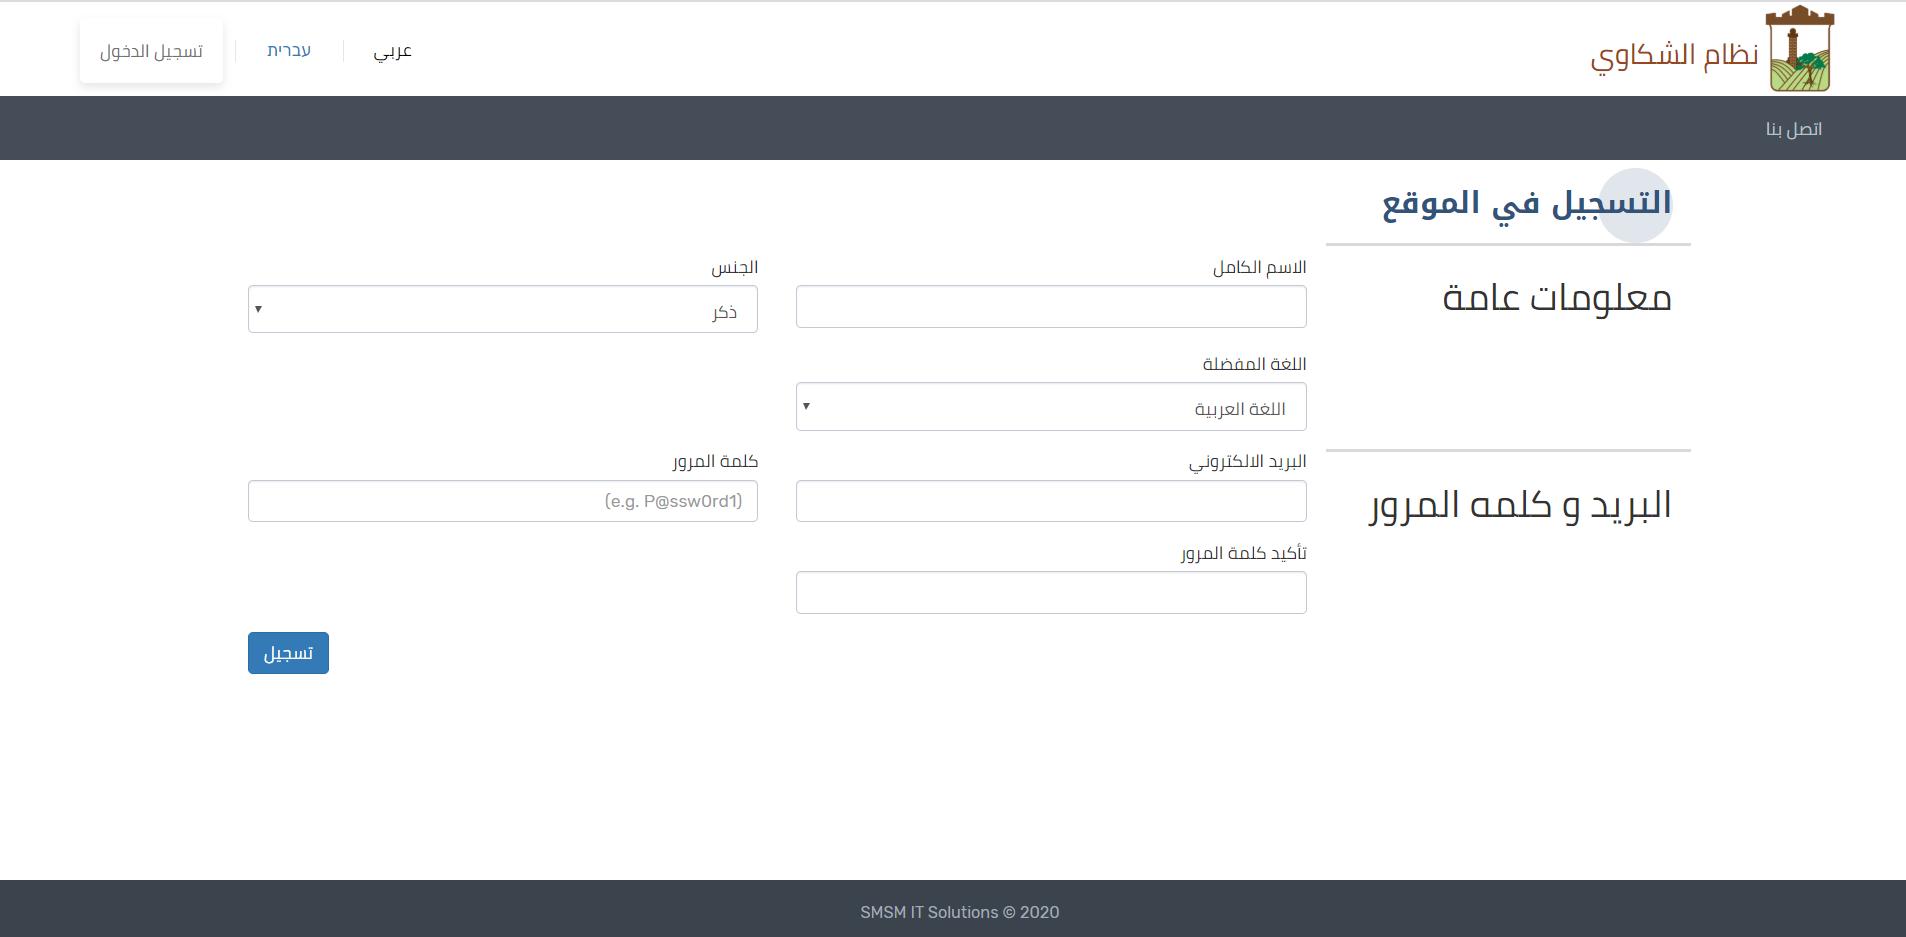 SMSM Complaints Management System